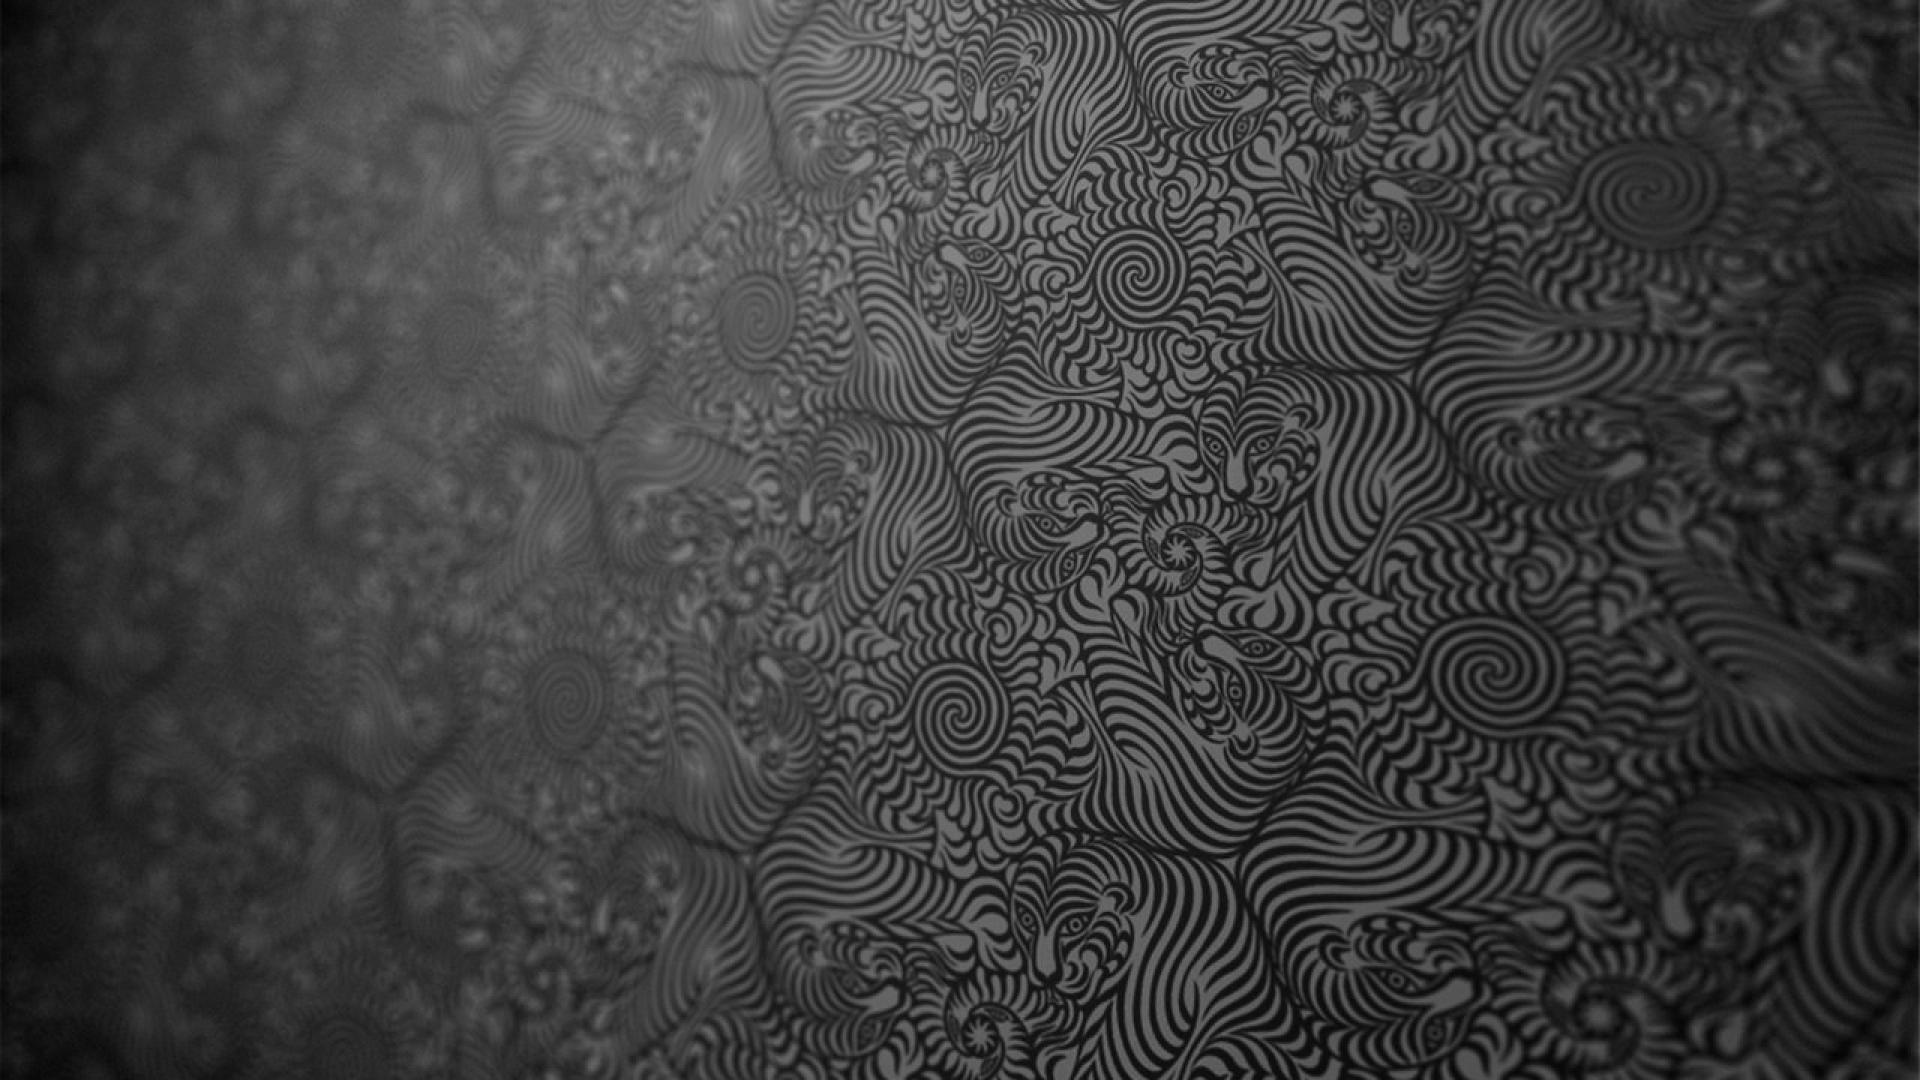 Black Psychedelic Background